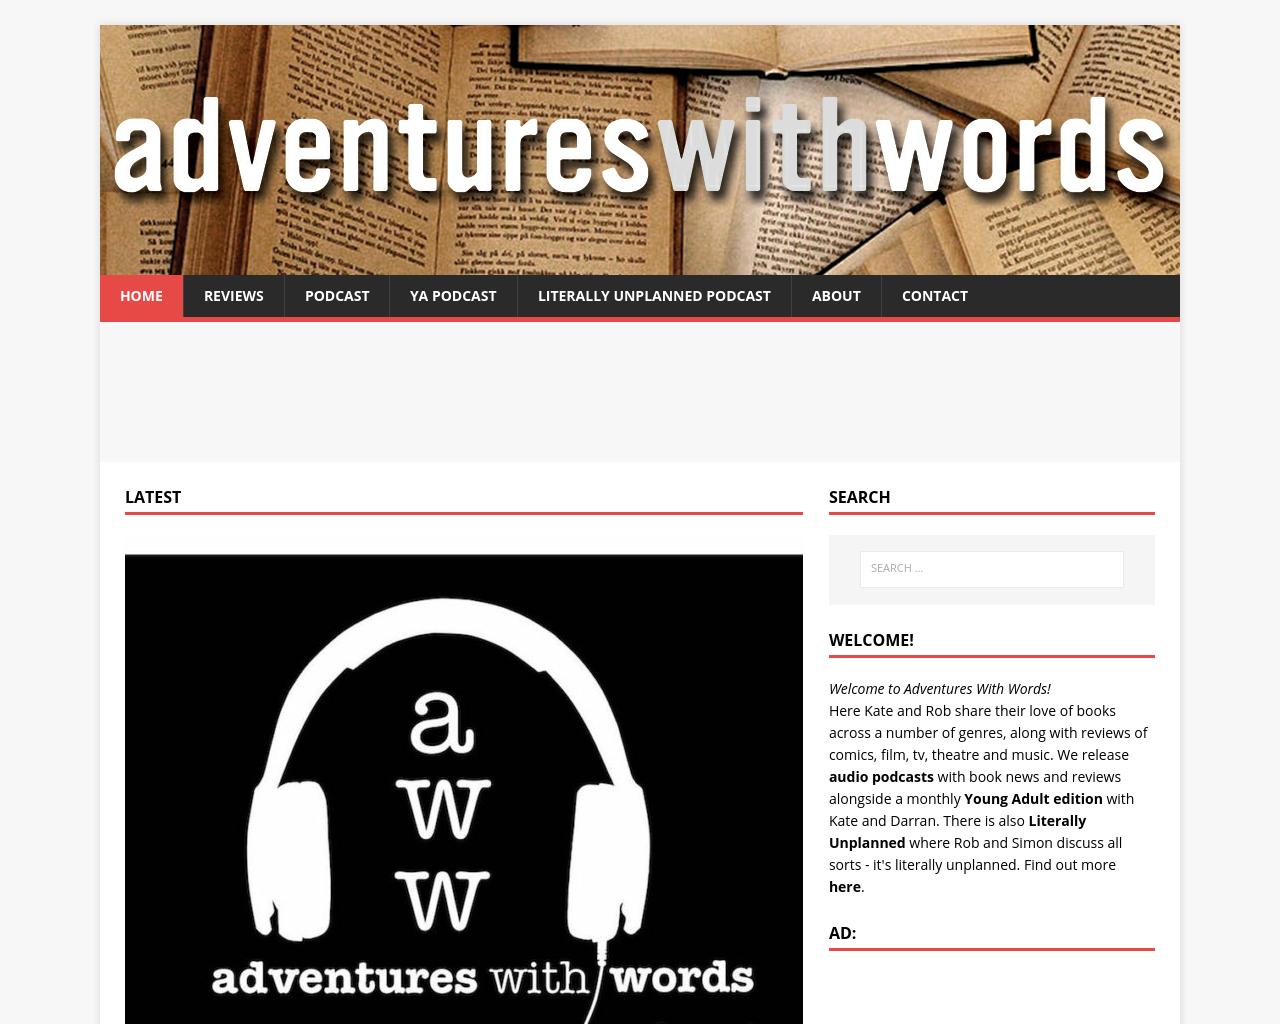 adventureswithwords-Advertising-Reviews-Pricing